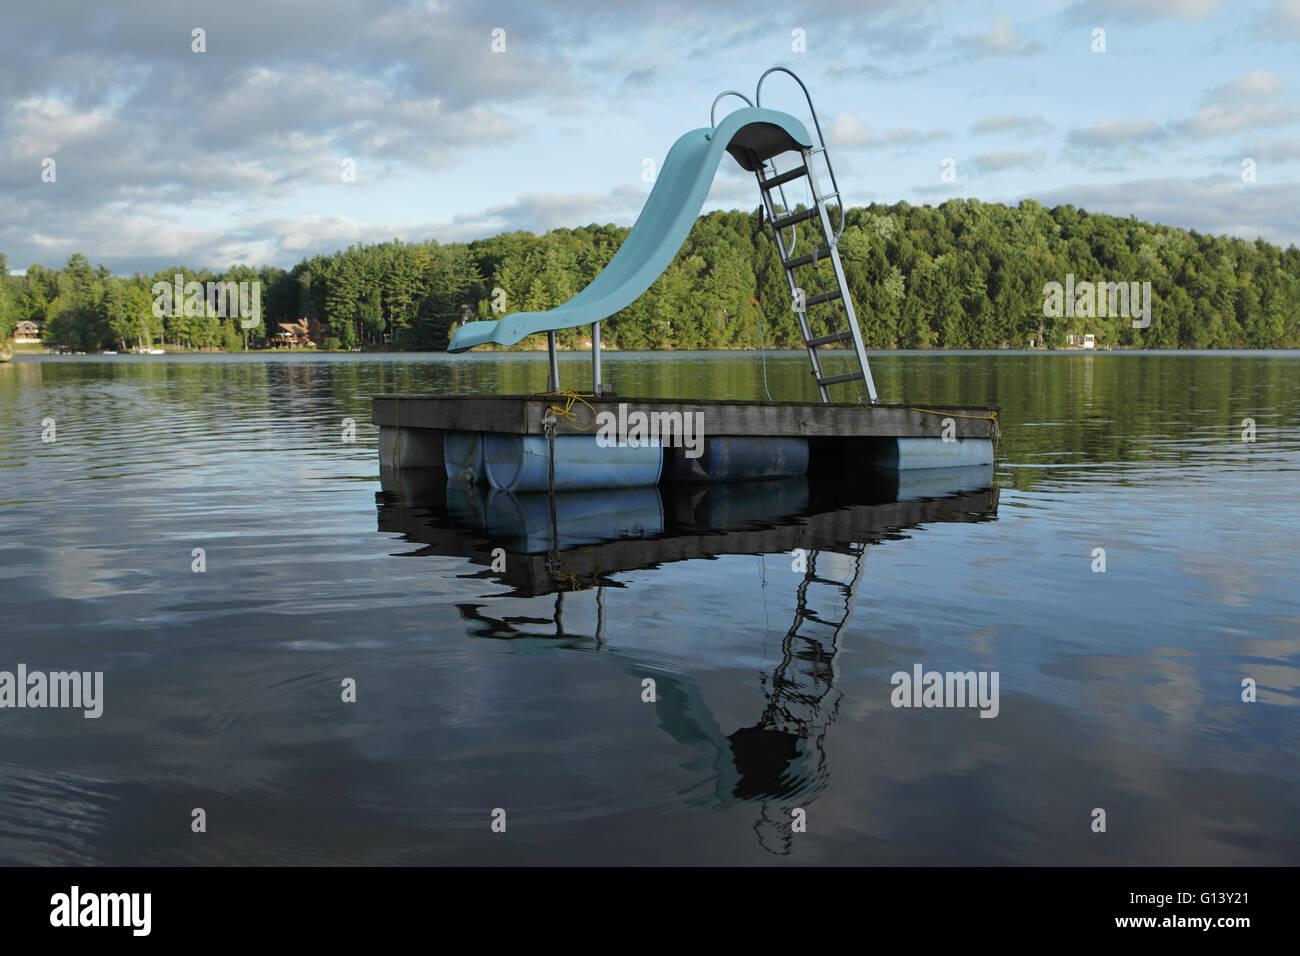 ozquatic floating water slide instructions